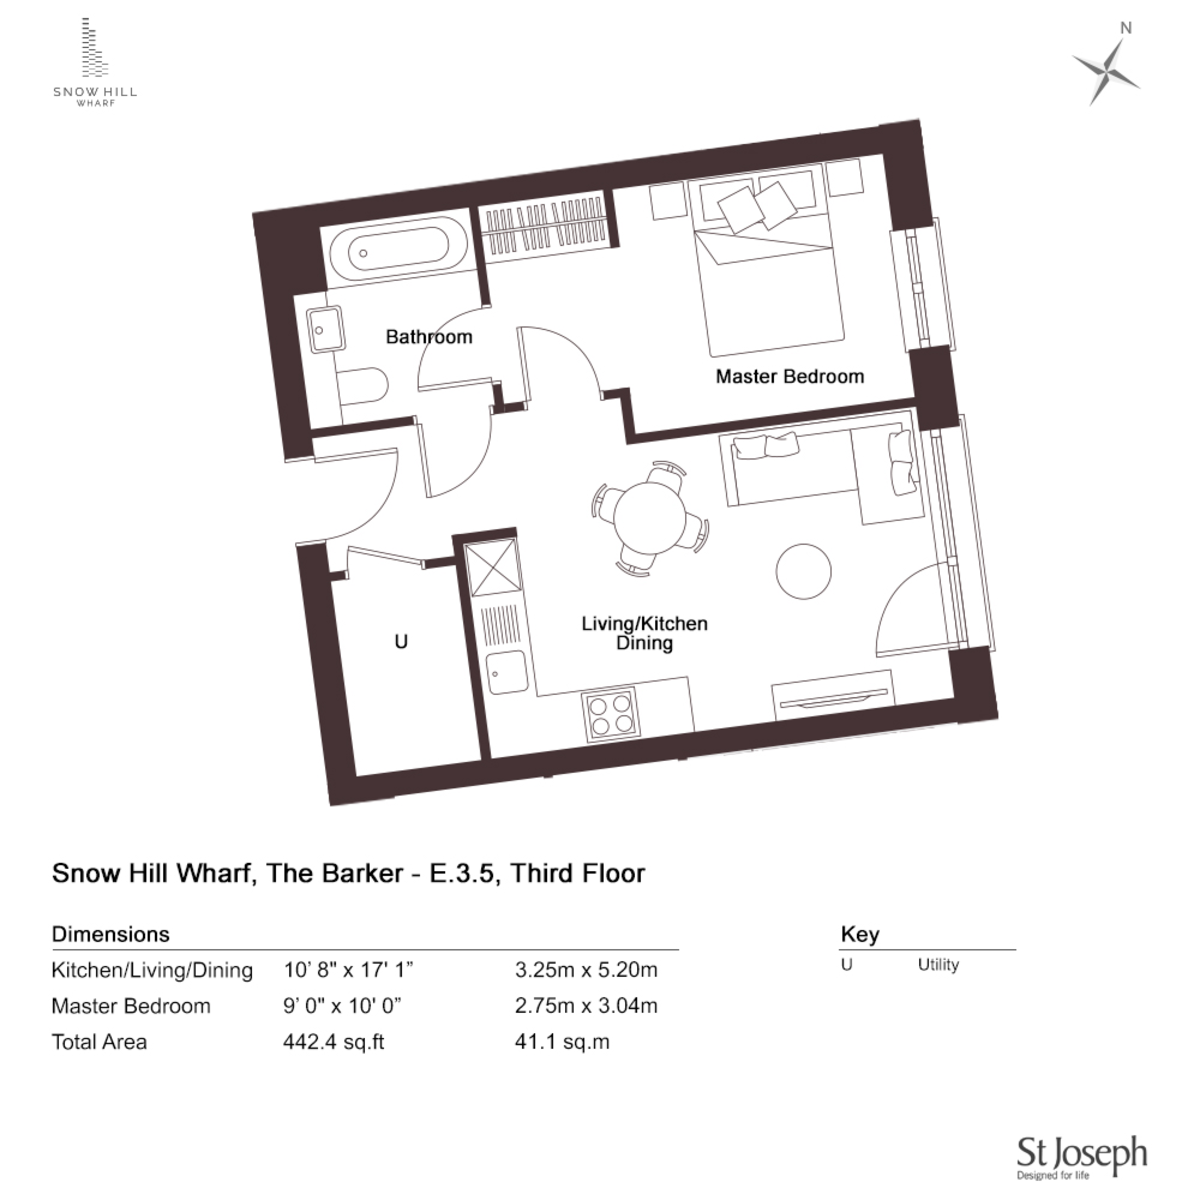 The Barker, Snow Hill Wharf, 61 Shadwell Street floorplan 1 of 1